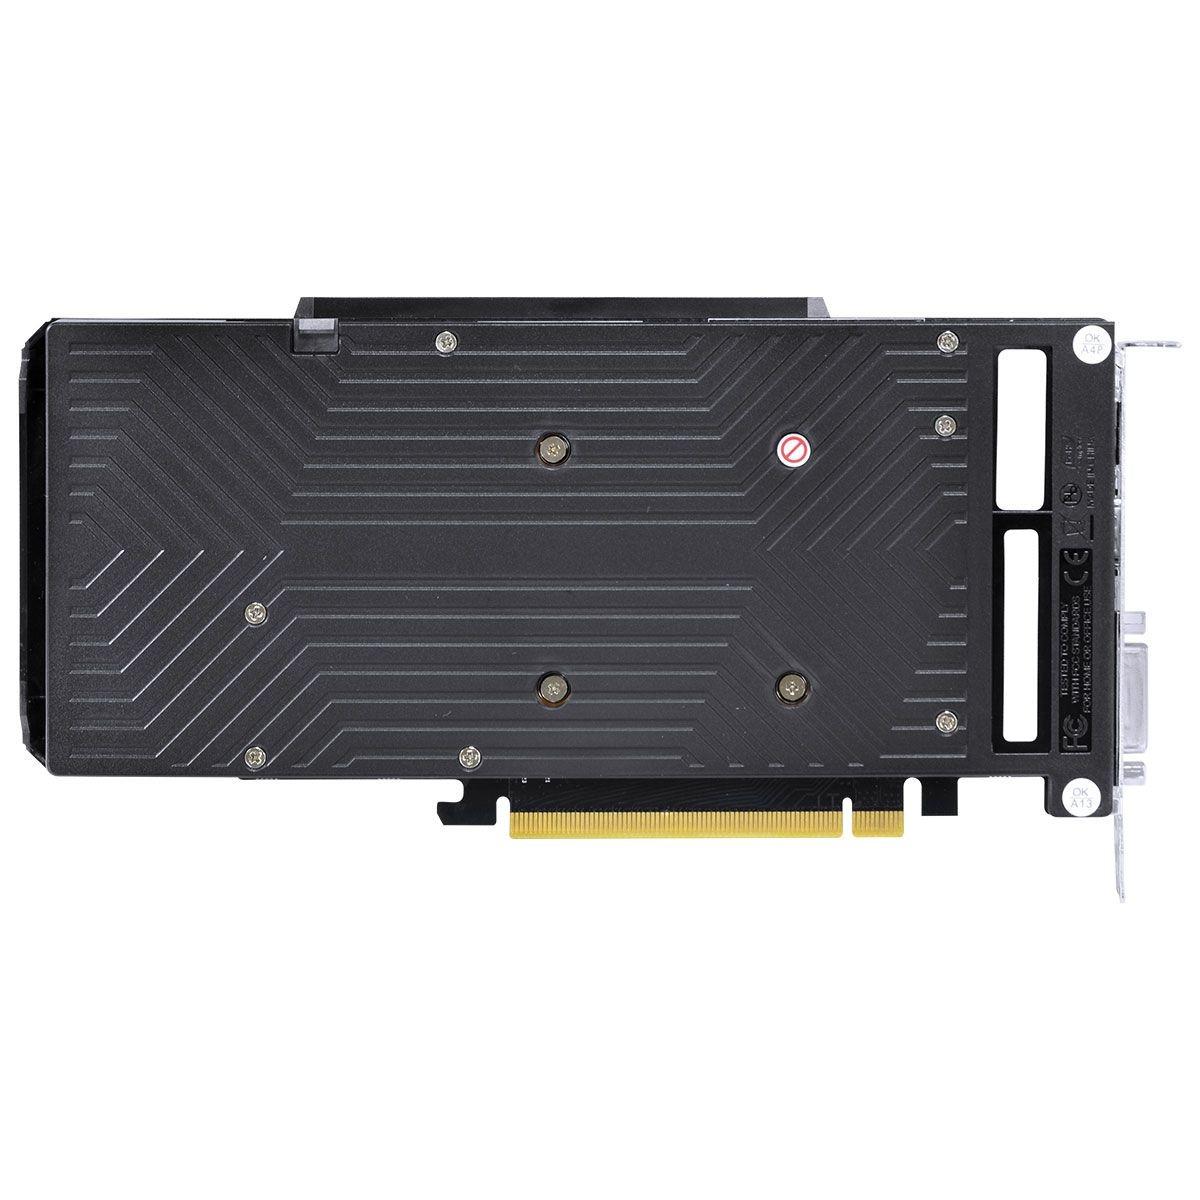 PLACA DE VIDEO NVIDIA GTX 1660 SUPER OC DUAL FAN GRAFFITI 6GB GDDR6 PPSOC16601926G6 PCYES